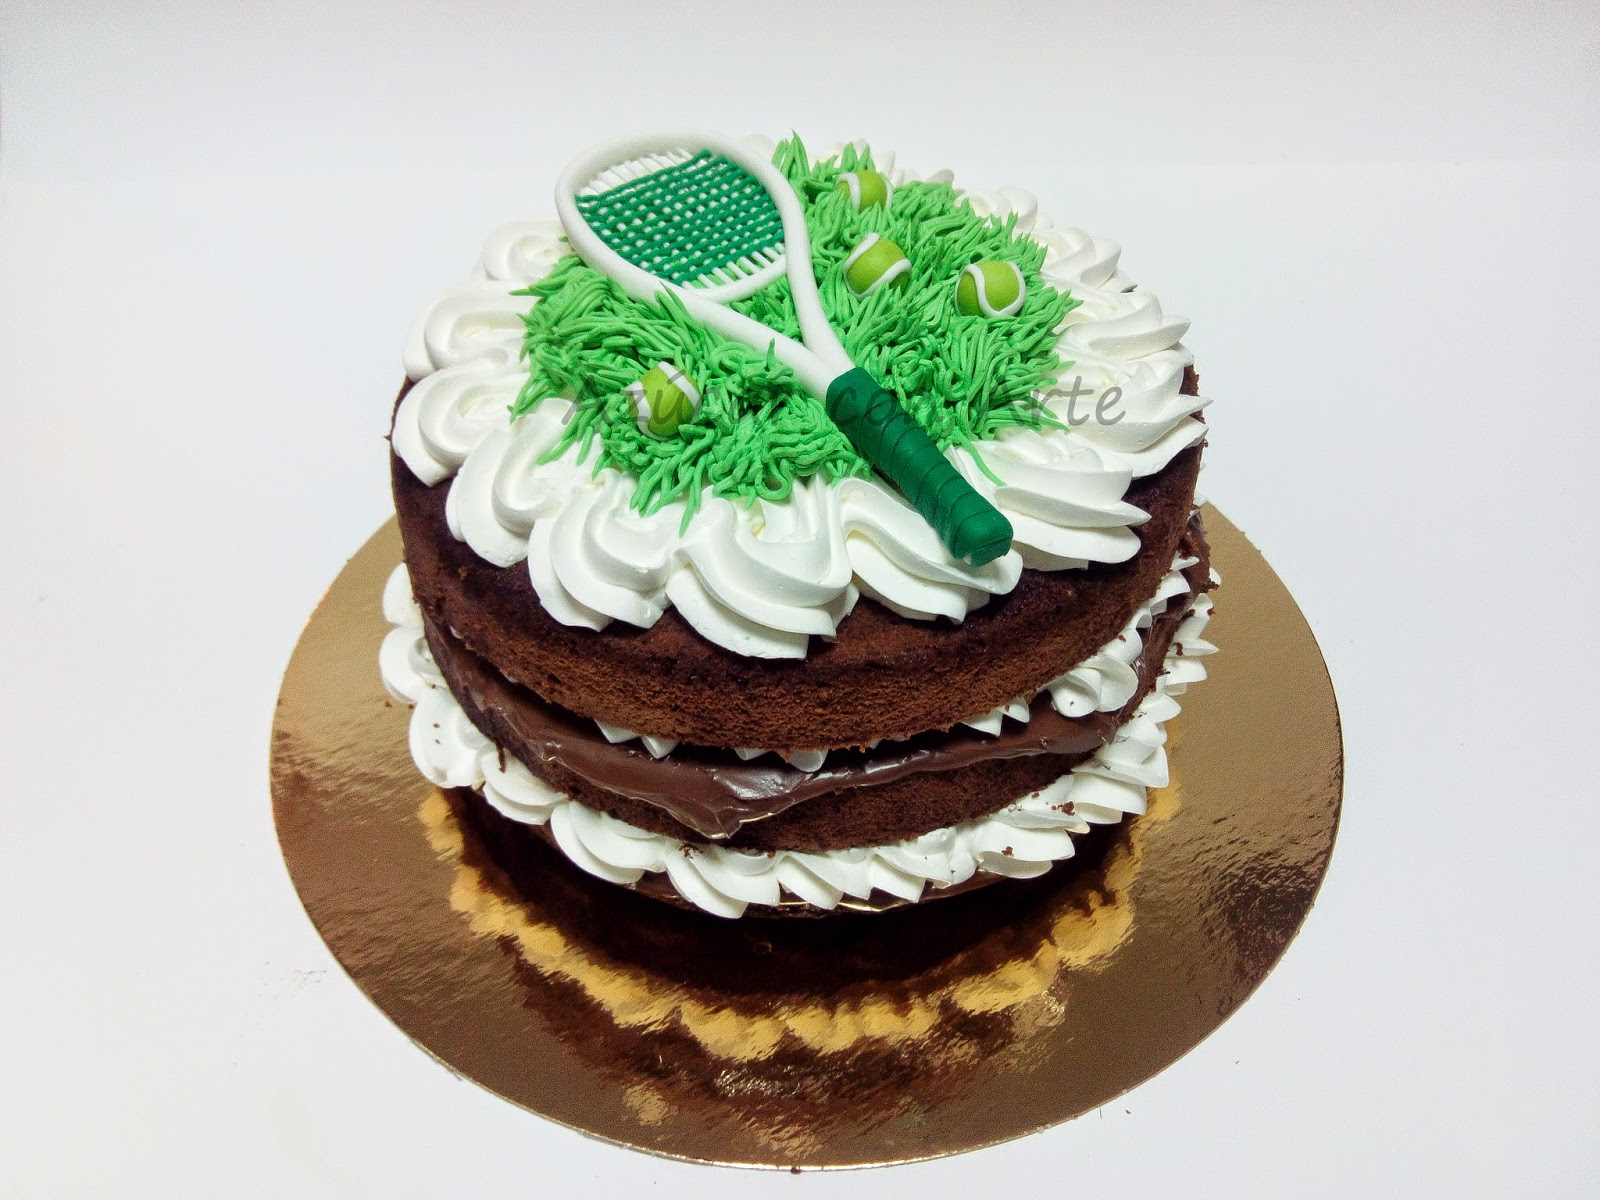 tarta tenis, tennis cake, sin gluten, tarta sin gluten, gluten free cake| azucar con arte